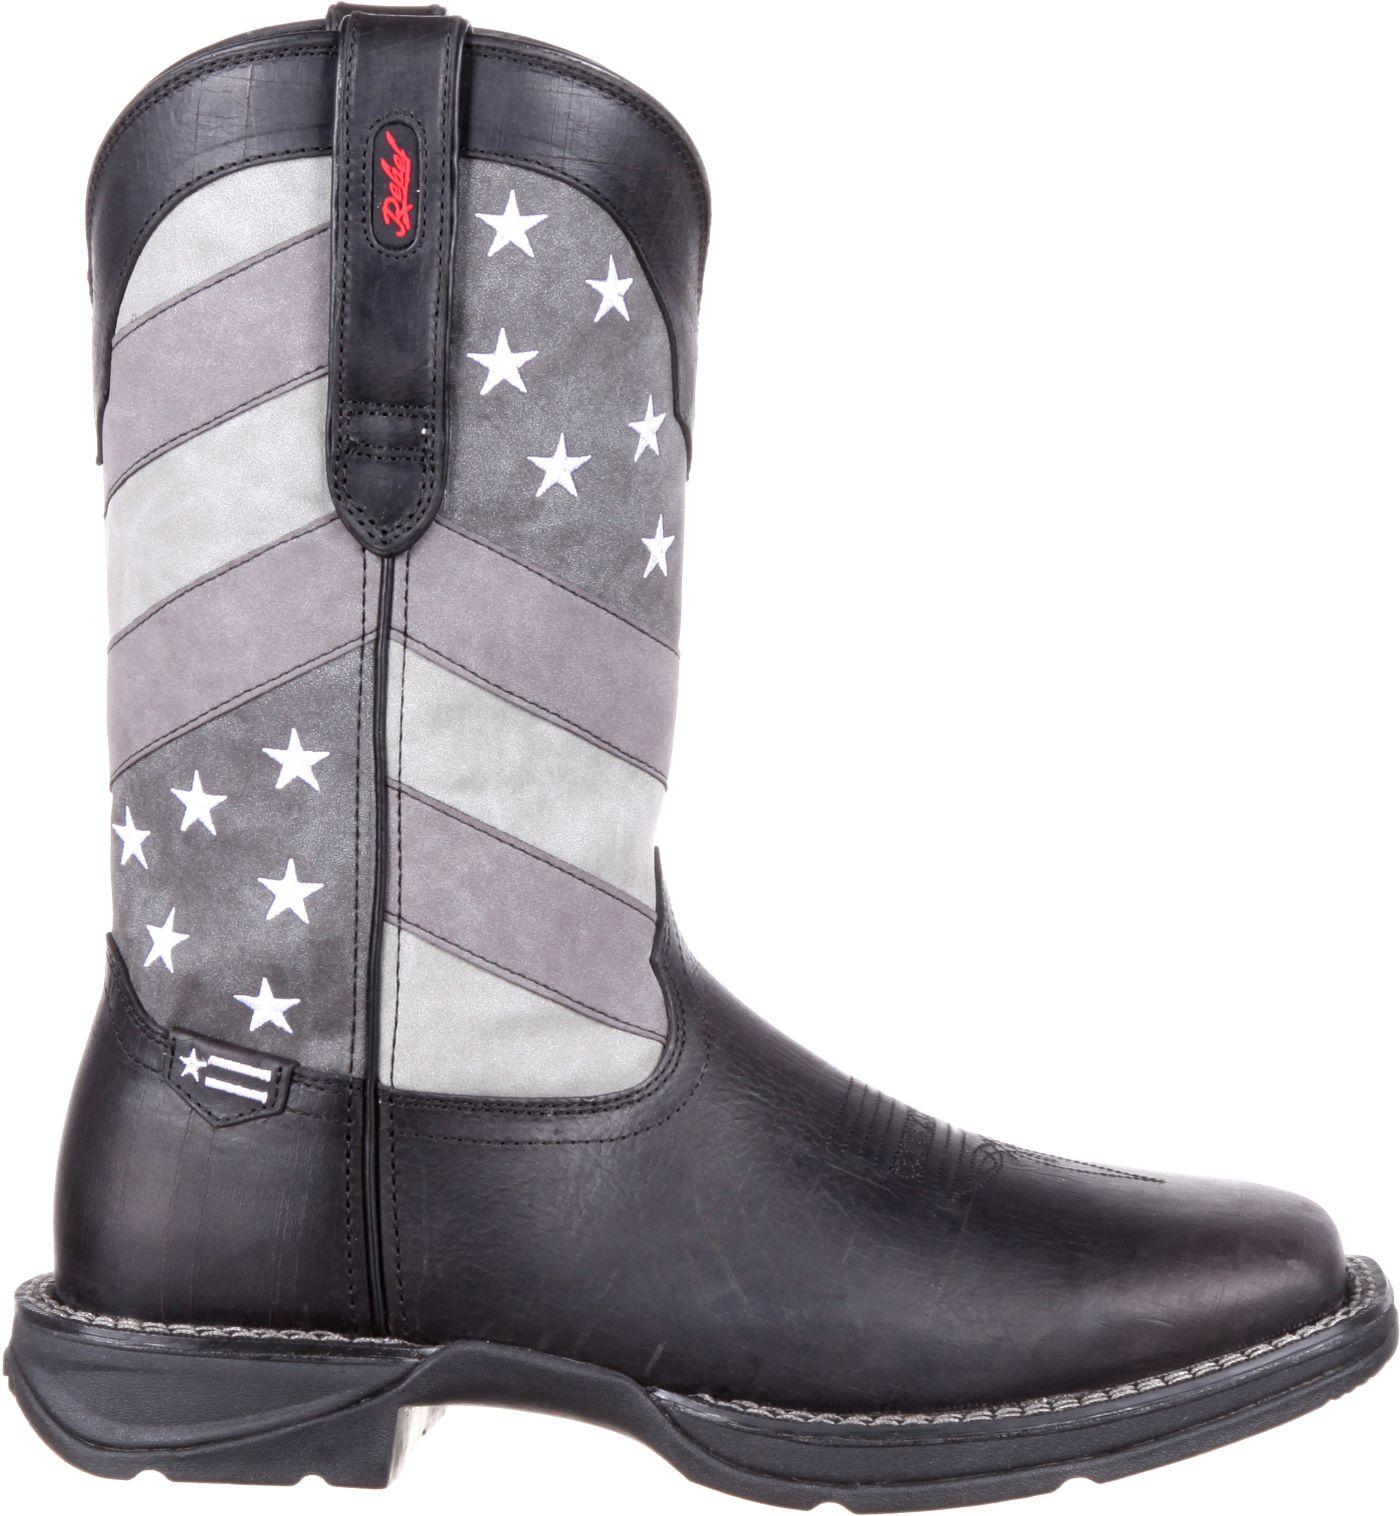 Durango Men's Faded Black Flag Western Boots